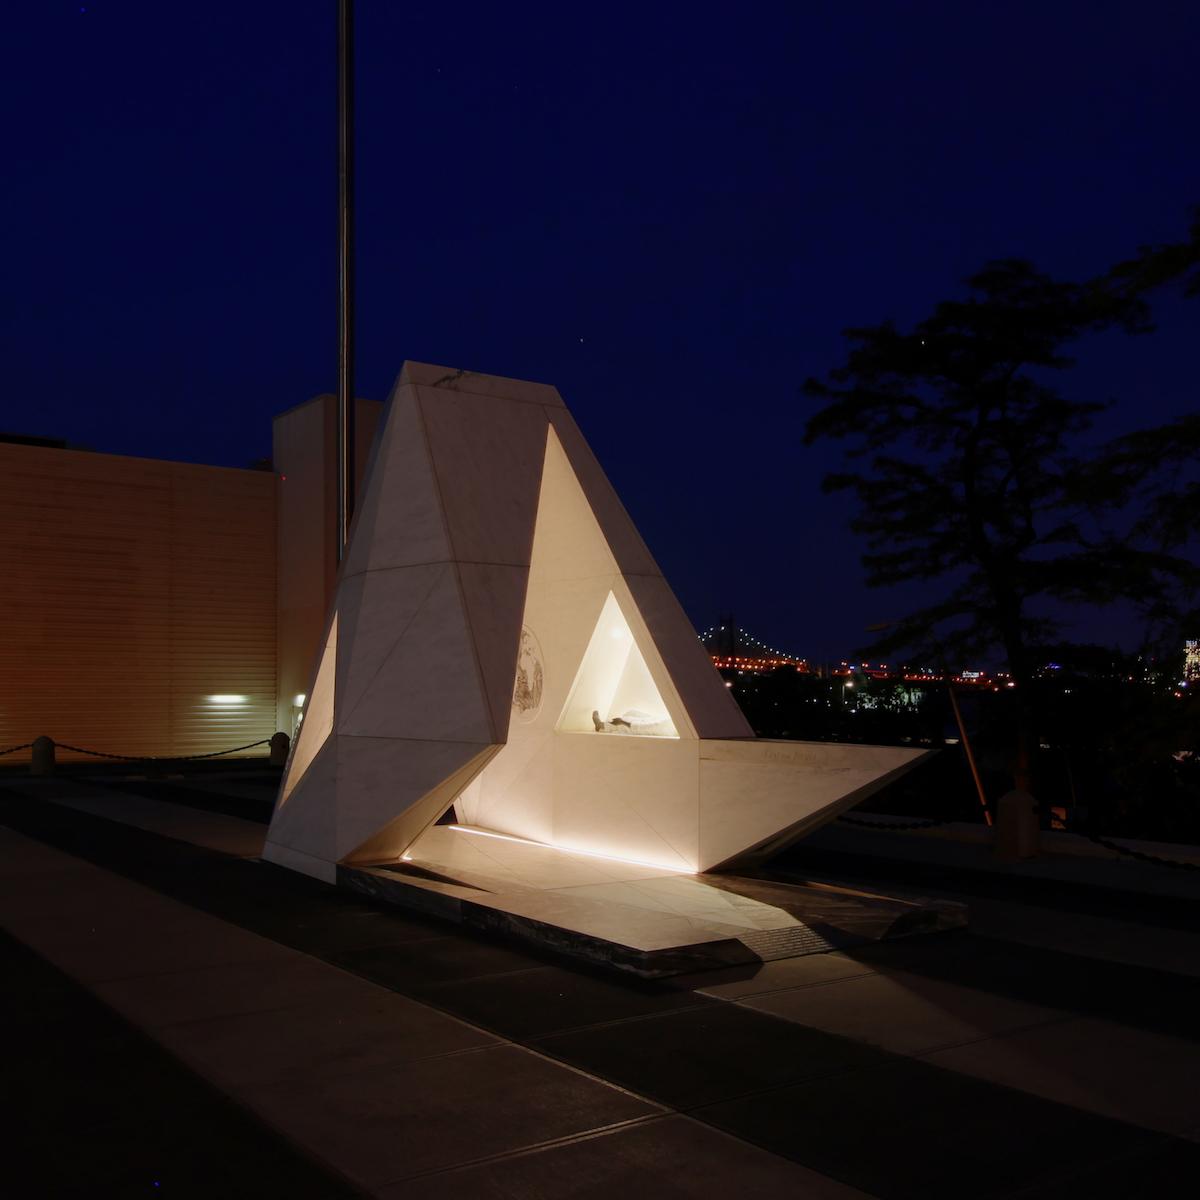 Abhay_Wadha_and_Rodney_Leon_Ark_of_Return_Rodney_Leon_Architect_with_AWA_Lighting_Designers_AWA_Lighting_Designers.jpg